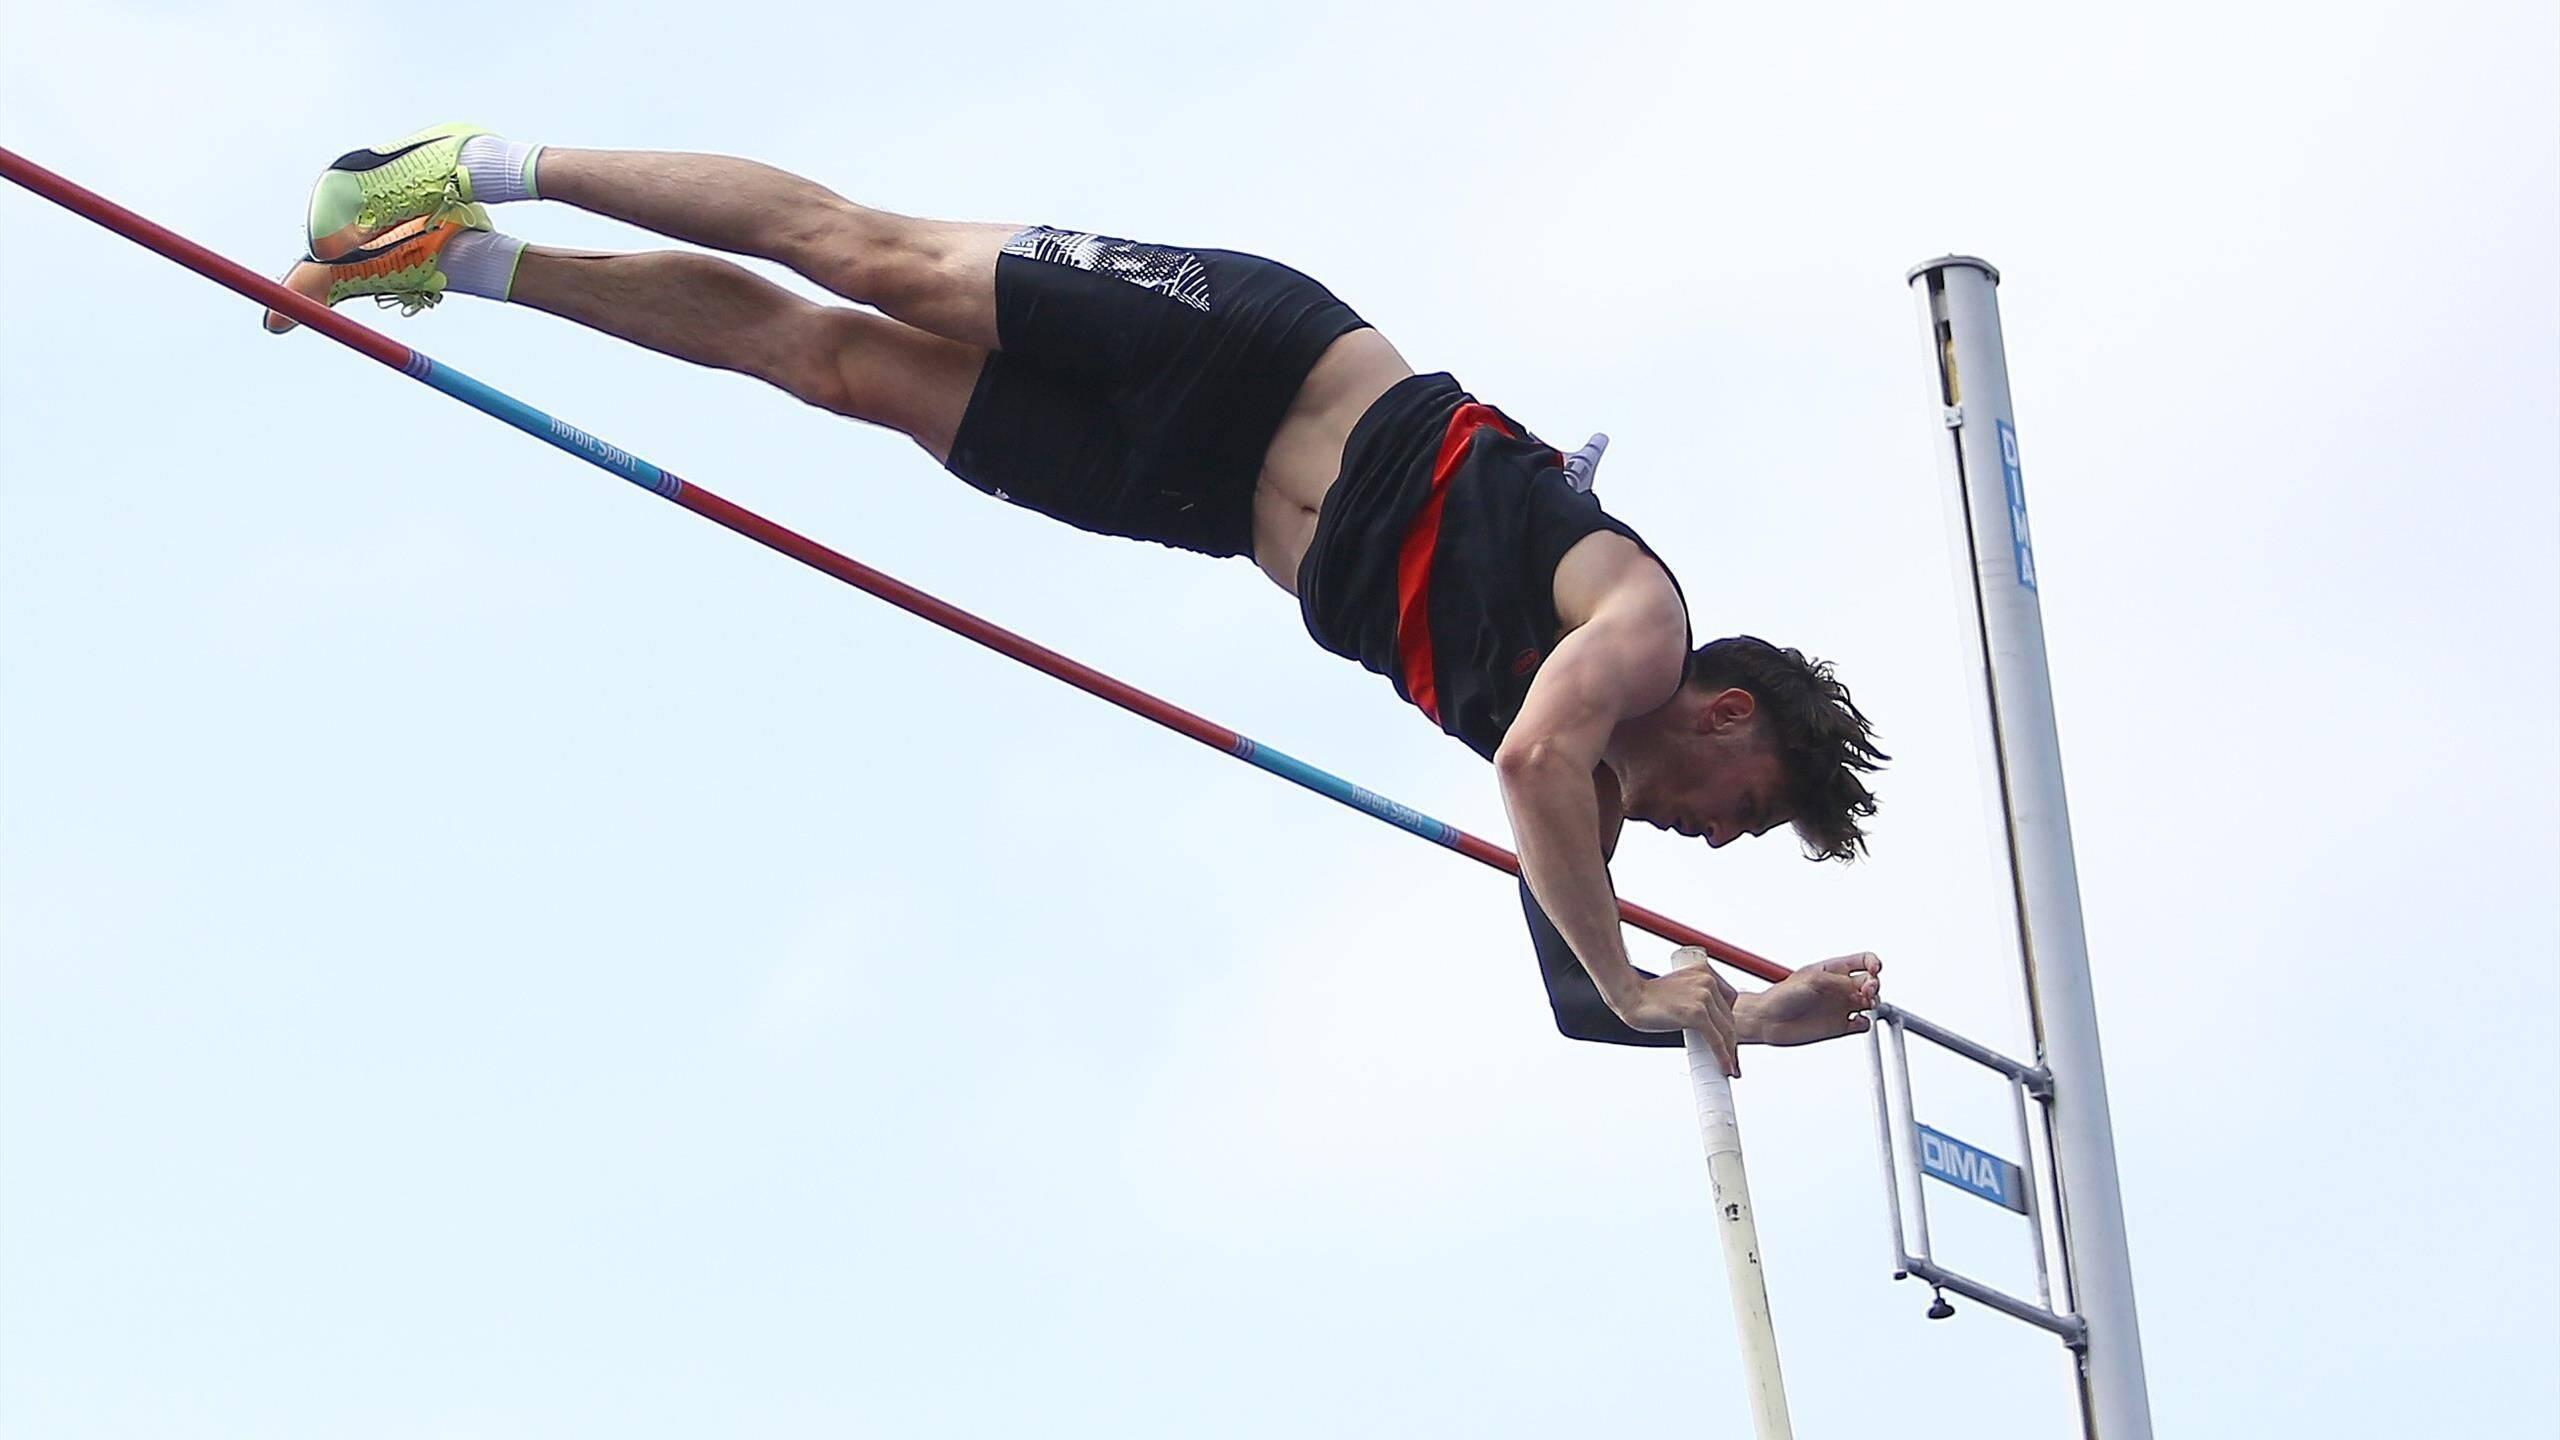 Harry Coppell, atleta olímpico. Foto: Instagram / Reprodução